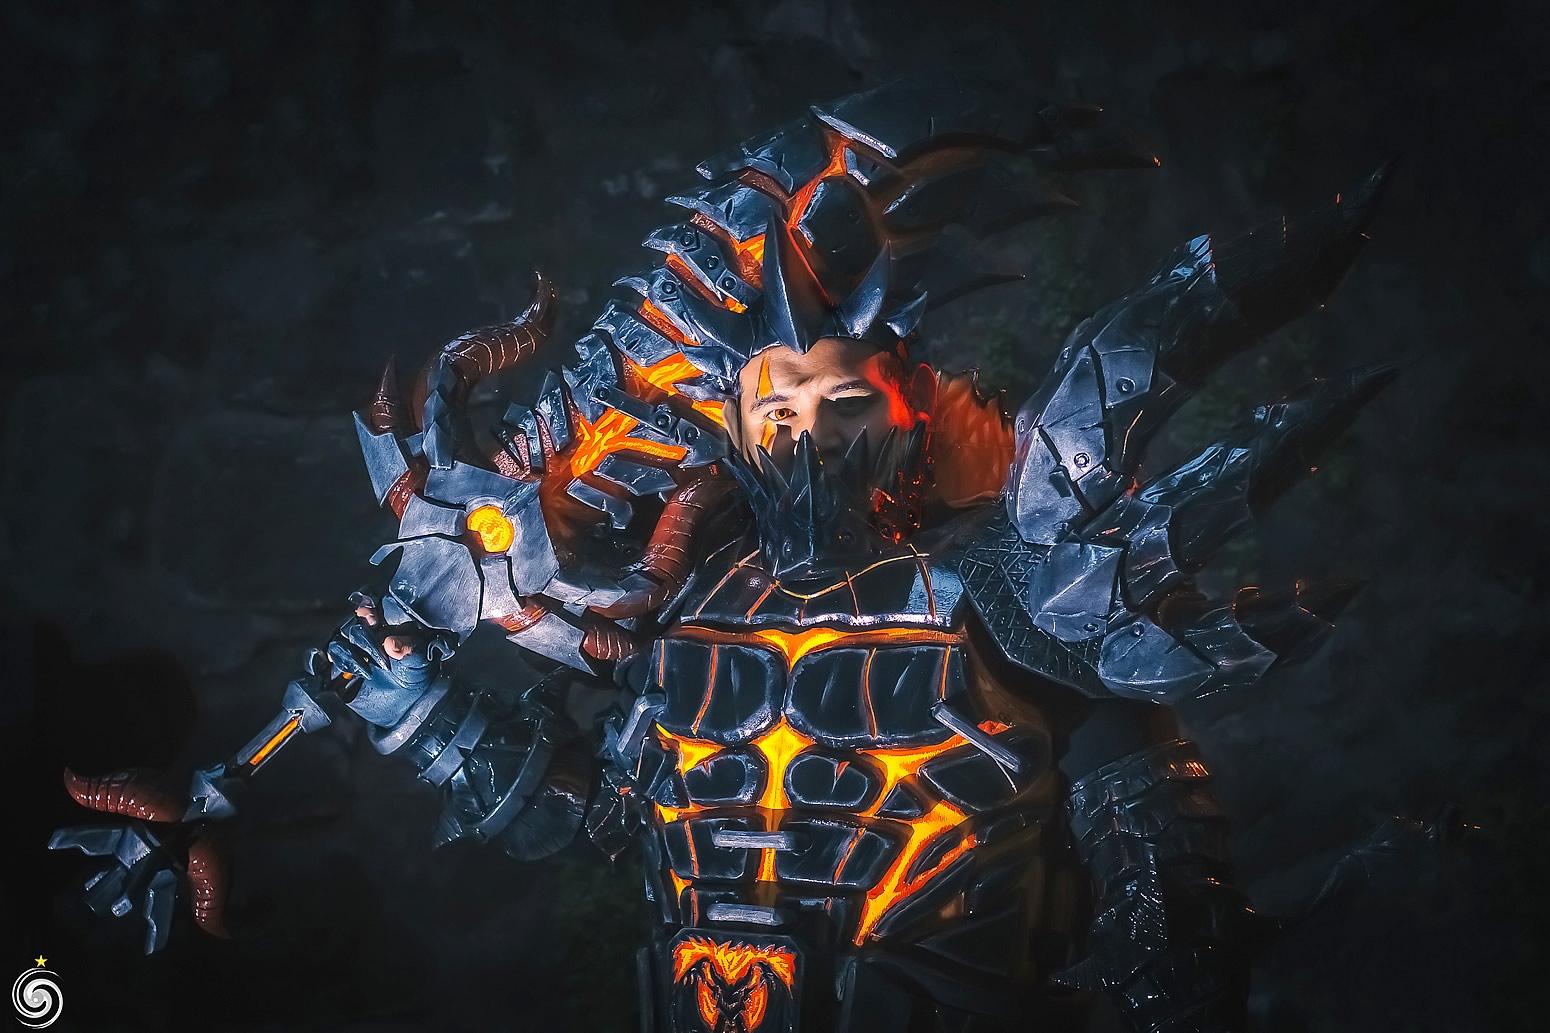 jozzafafqian jq cosplayer max sagan - Jozzafafqian - Cosplayer